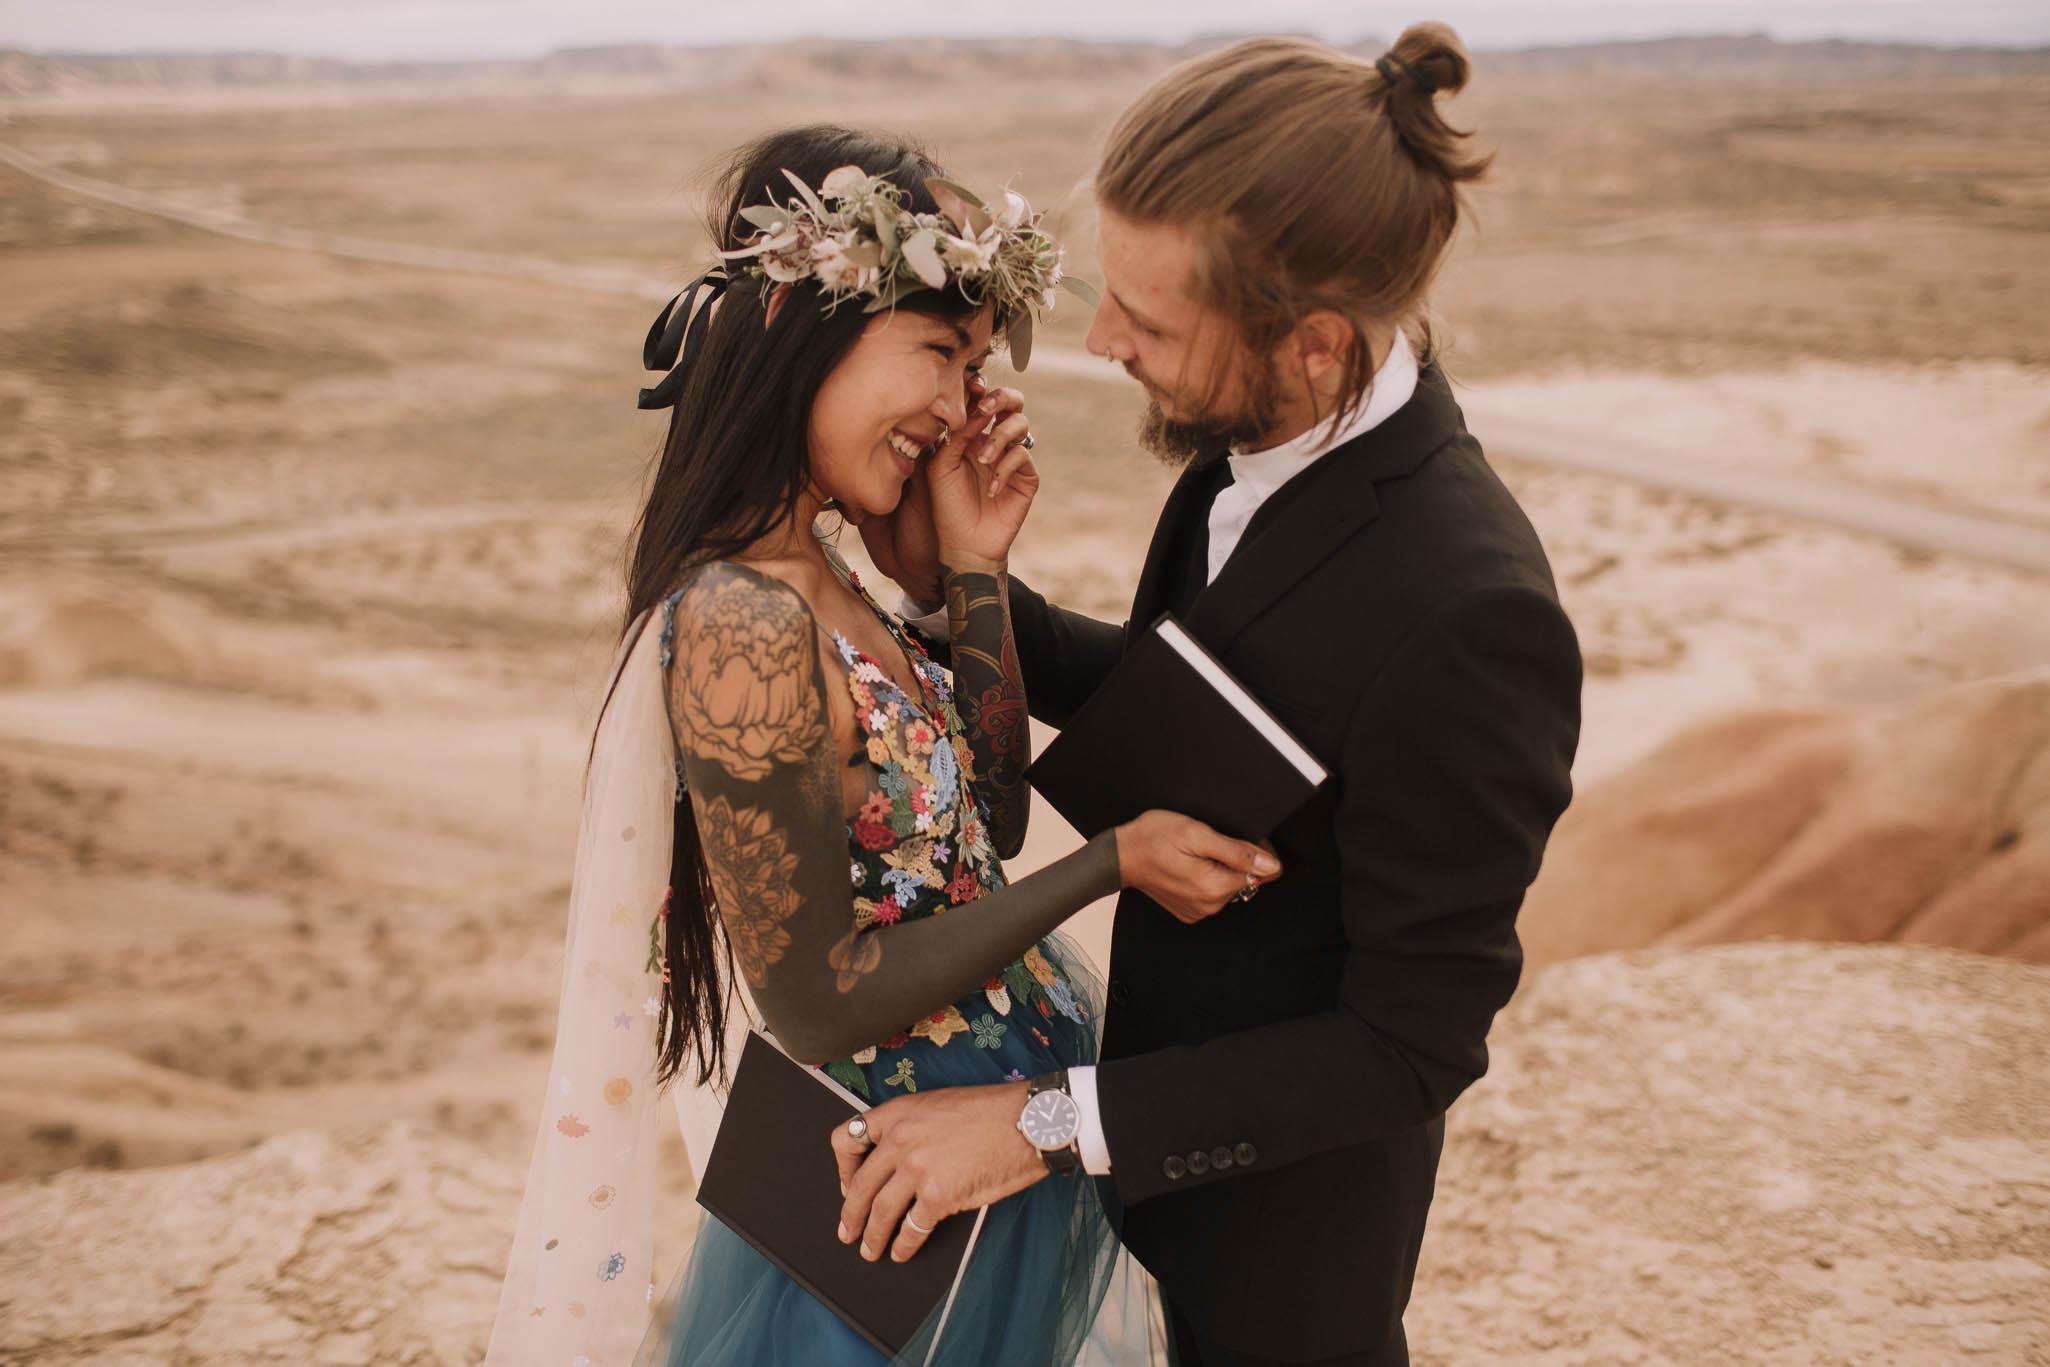 Spain-wedding-photographer-bardenas-reales-jeremy-boyer-photographe-mariage-bordeaux-floral-wedding-dress-robe-101.jpg